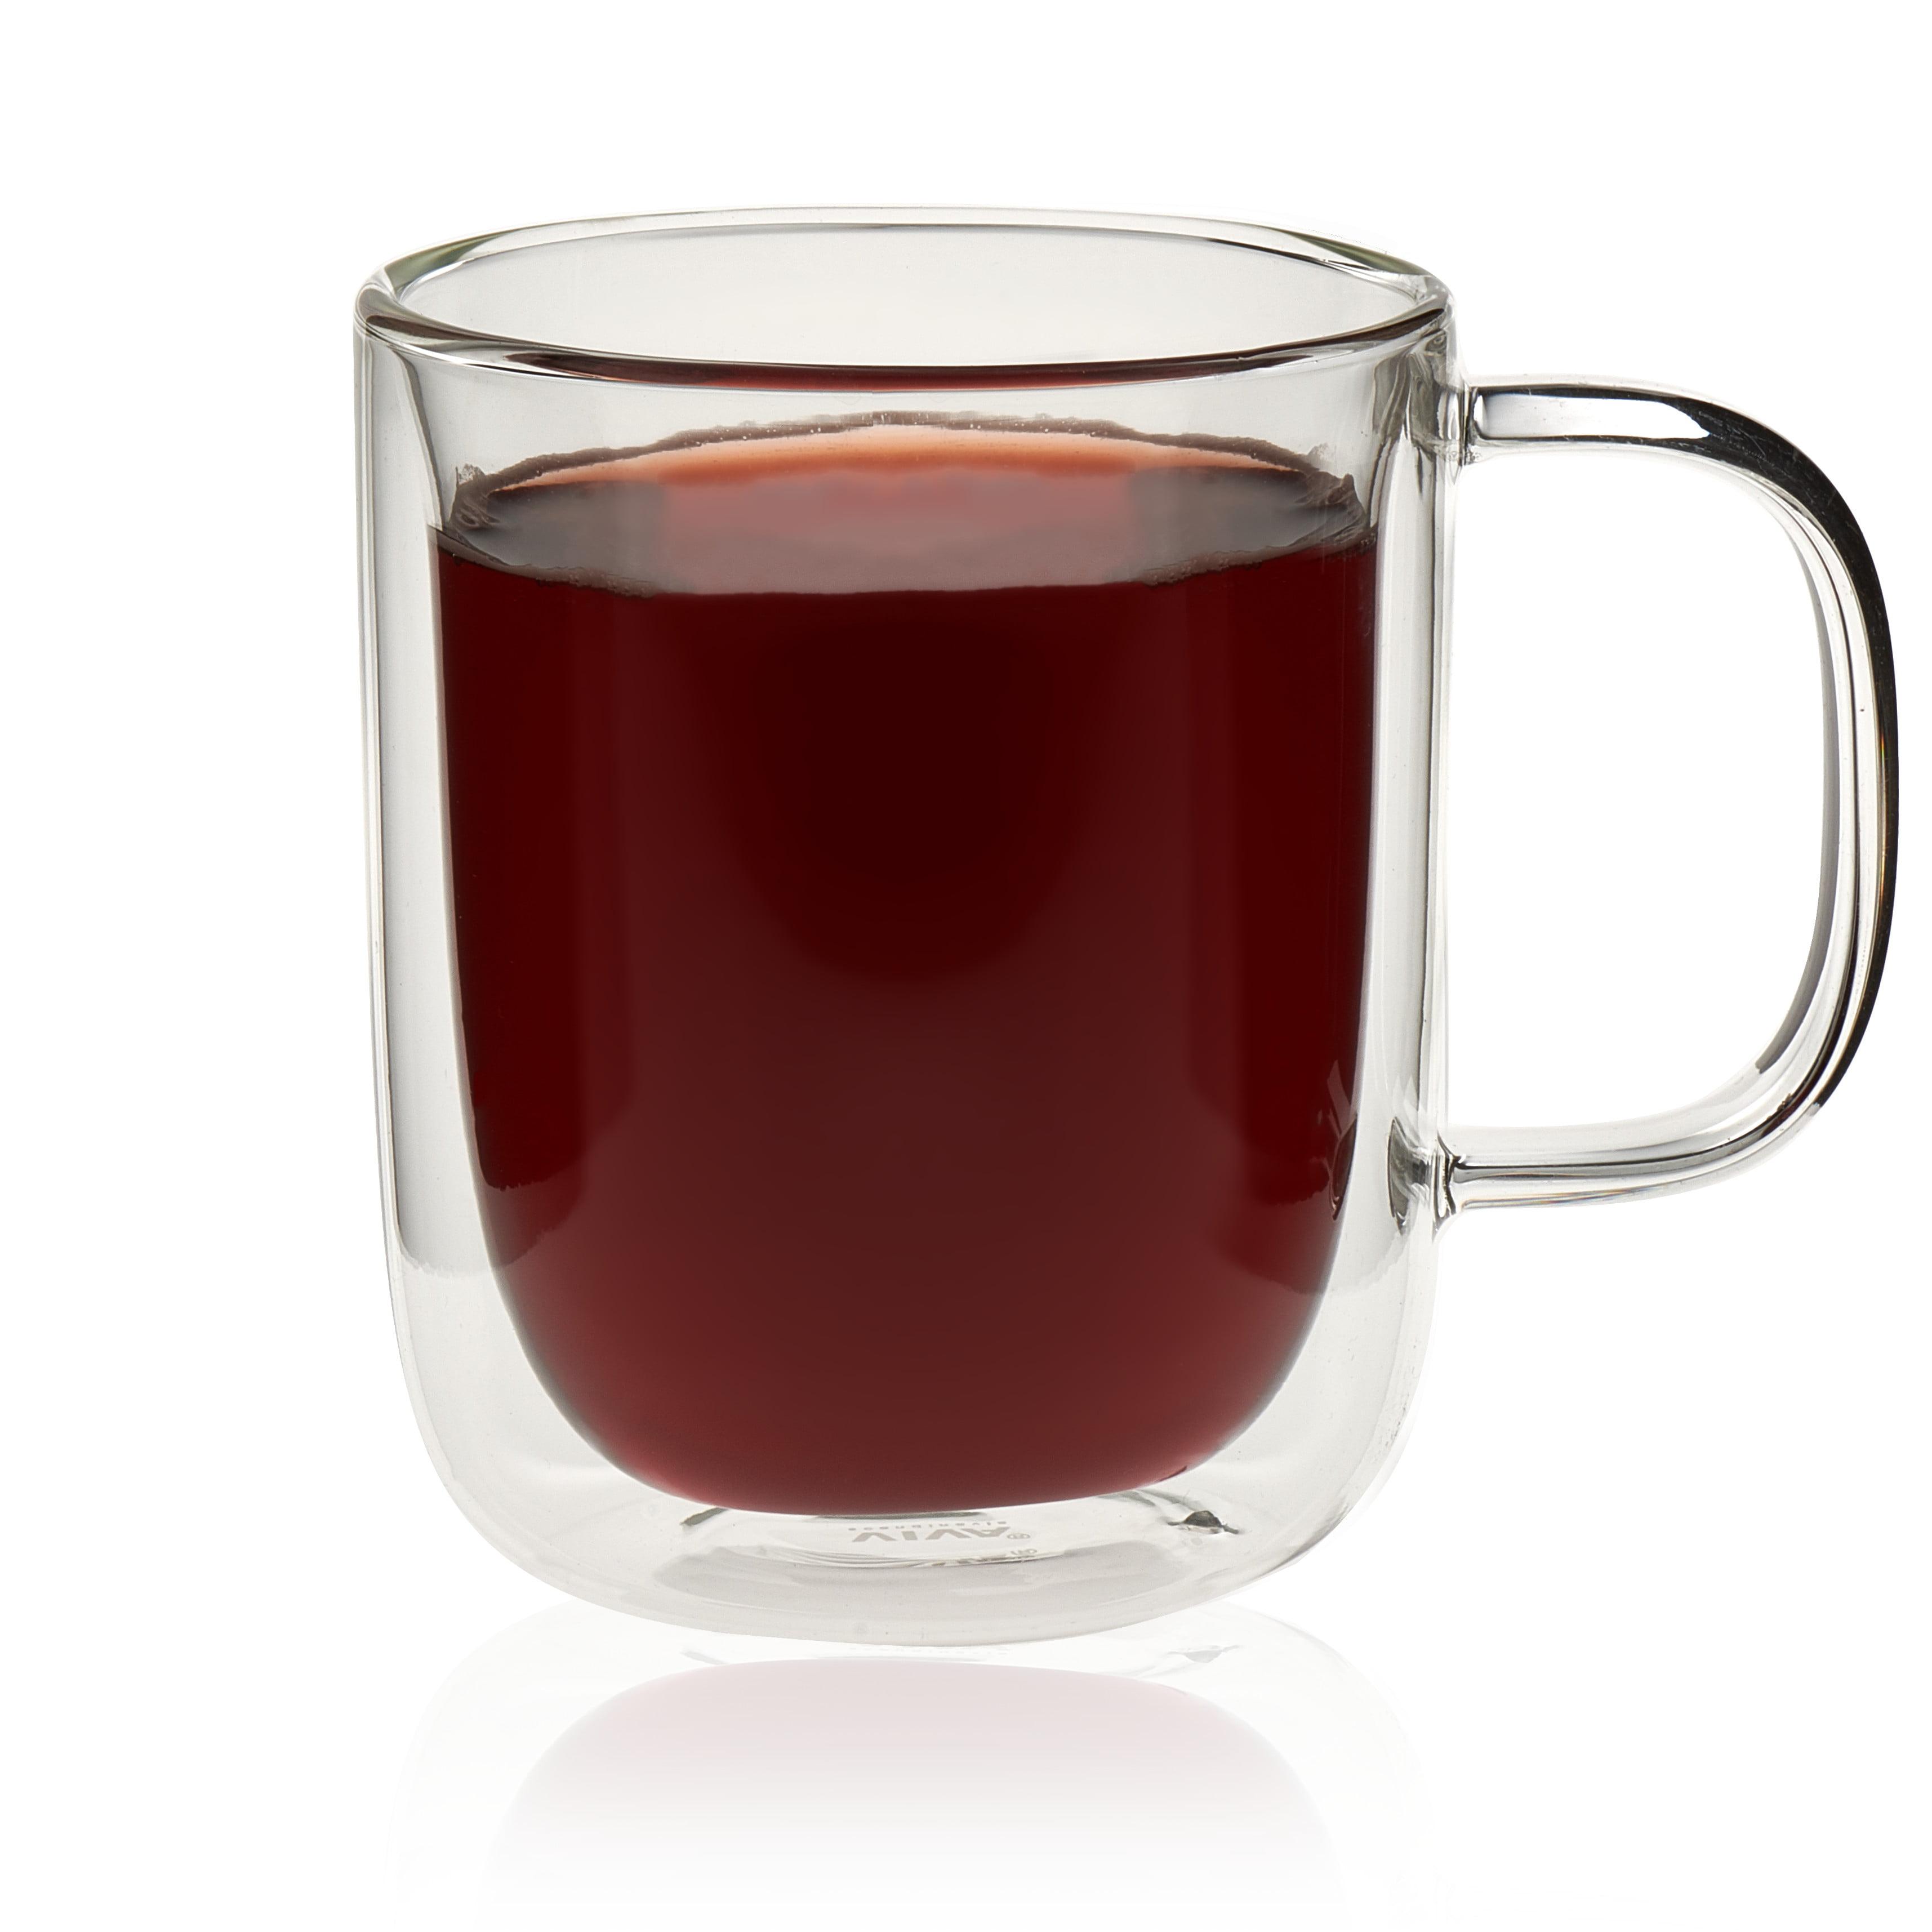 VIVA Scandinavia Classic Double Walled Glass with Handle Set, 12.5-ounce Handled Tea Glasses, Borosilicate (Set of 4)